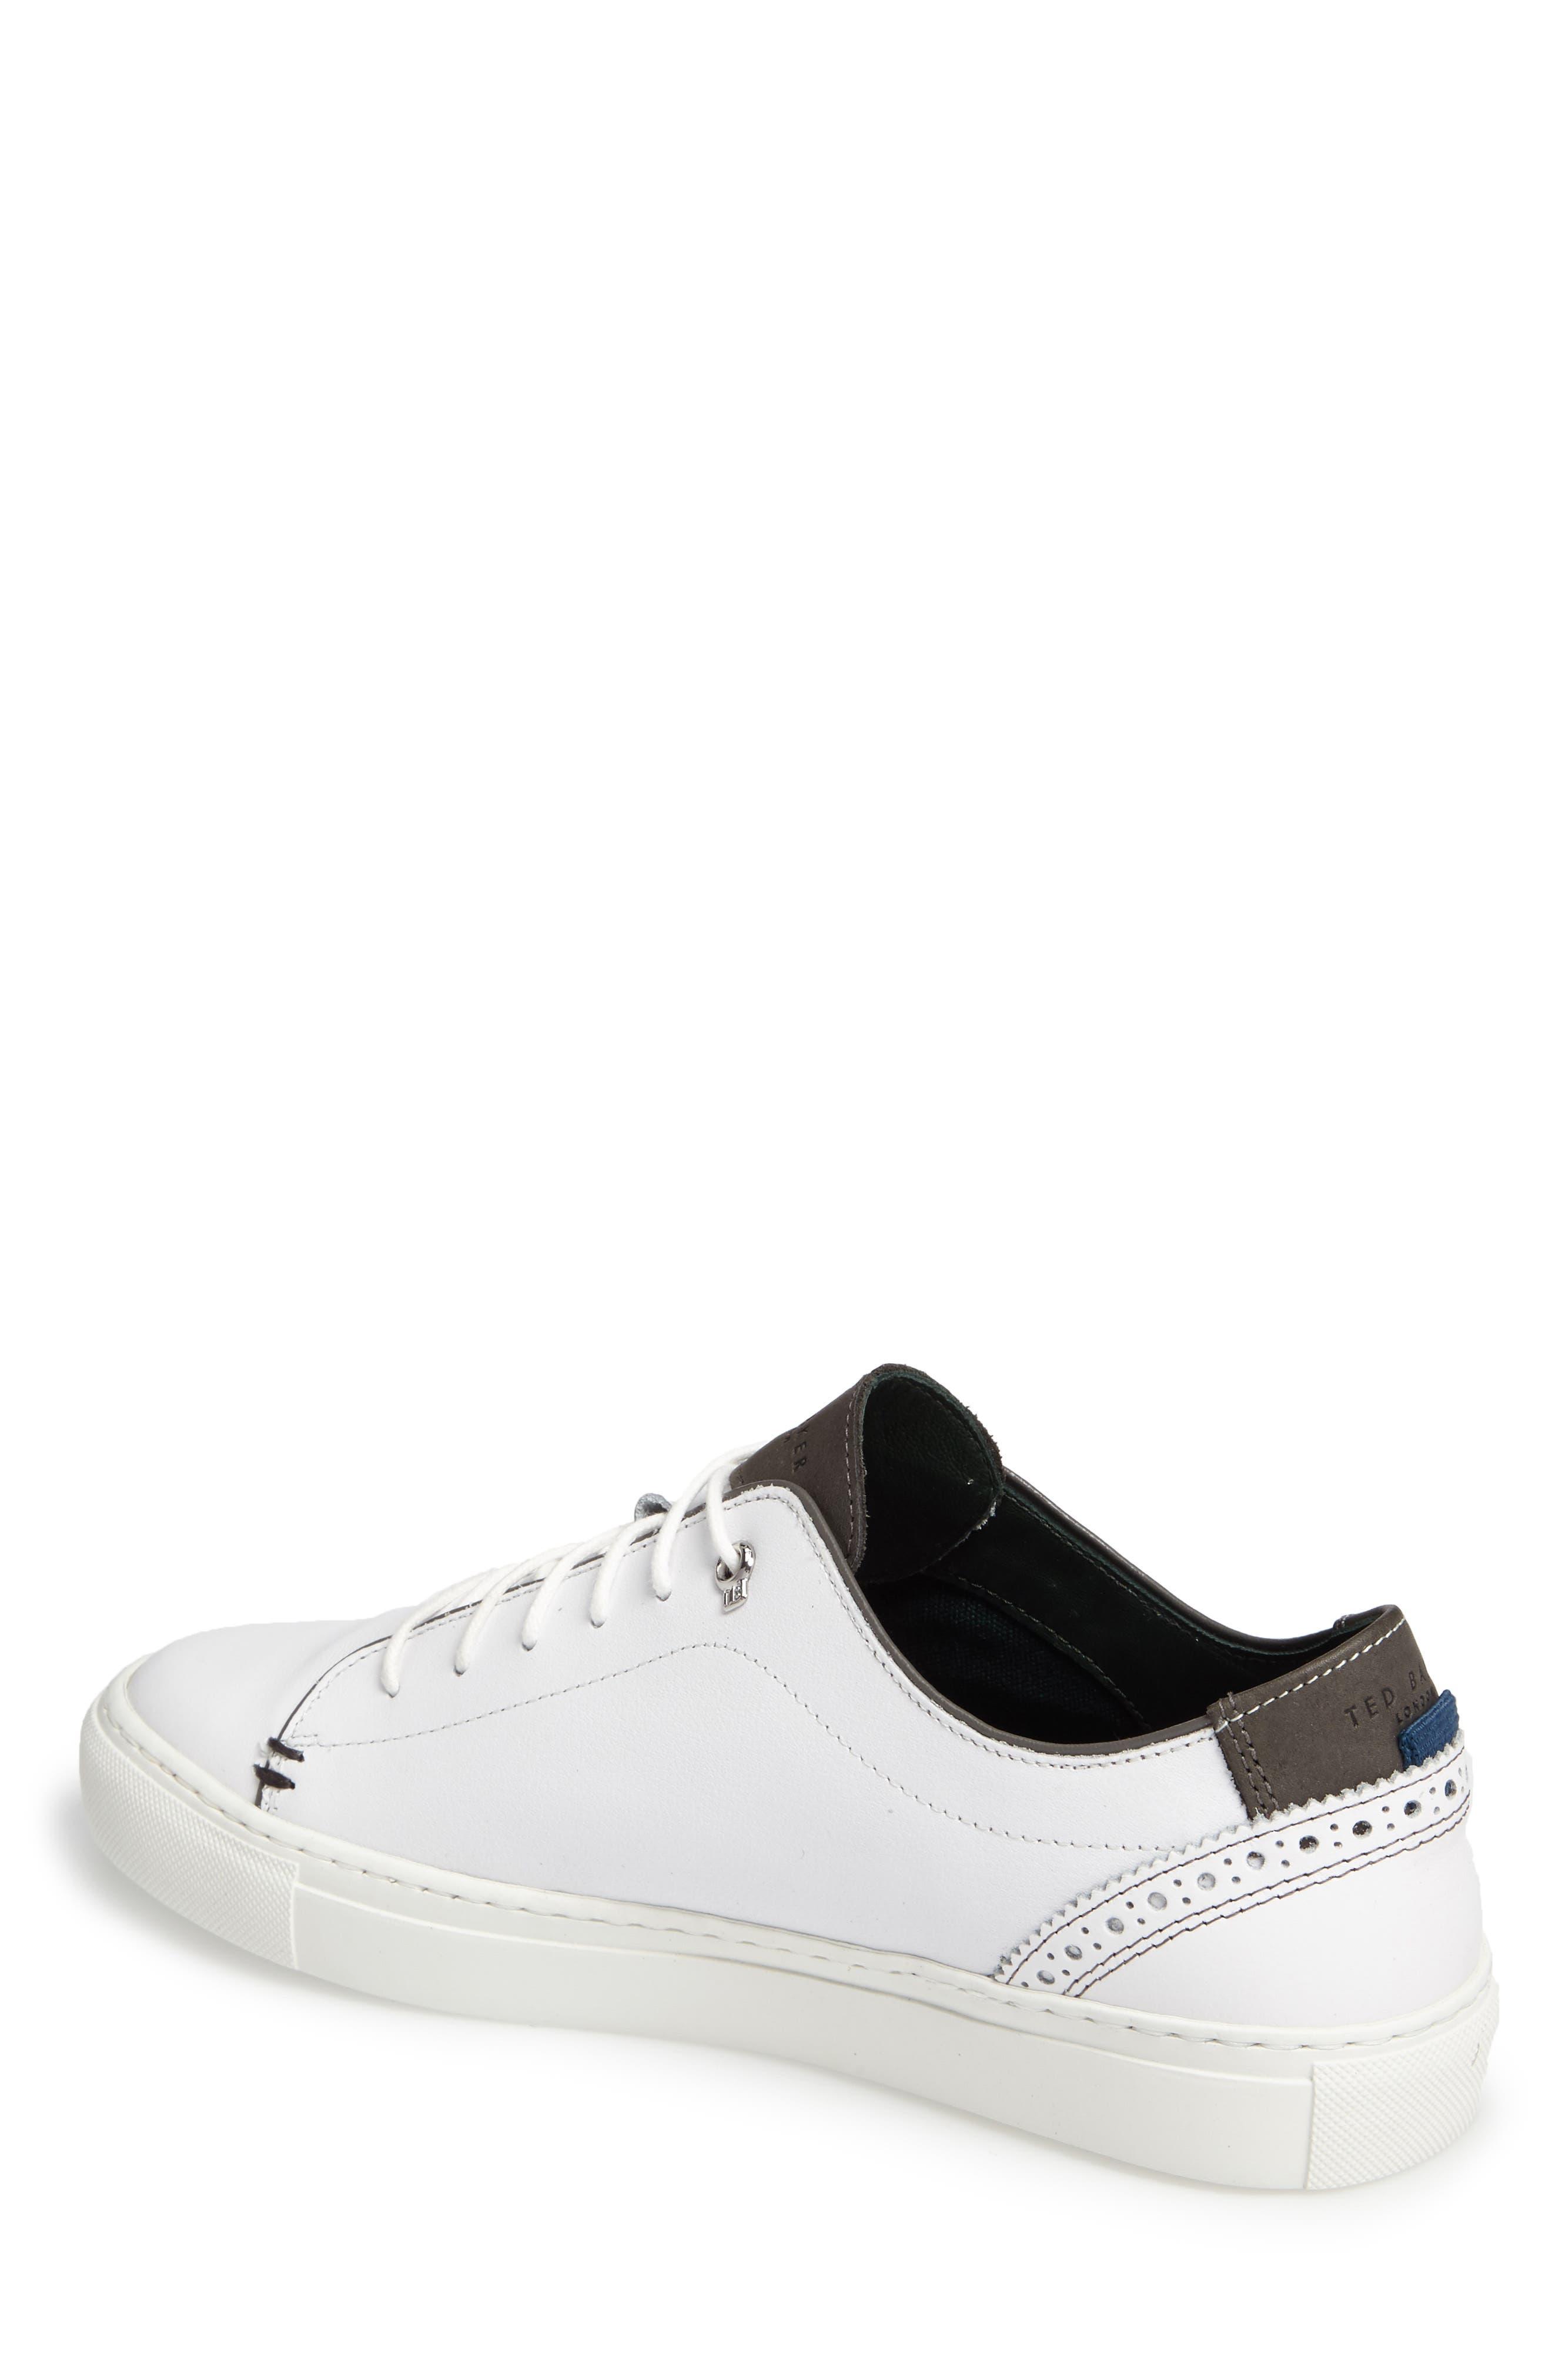 'Kiing Classic' Sneaker,                             Alternate thumbnail 17, color,